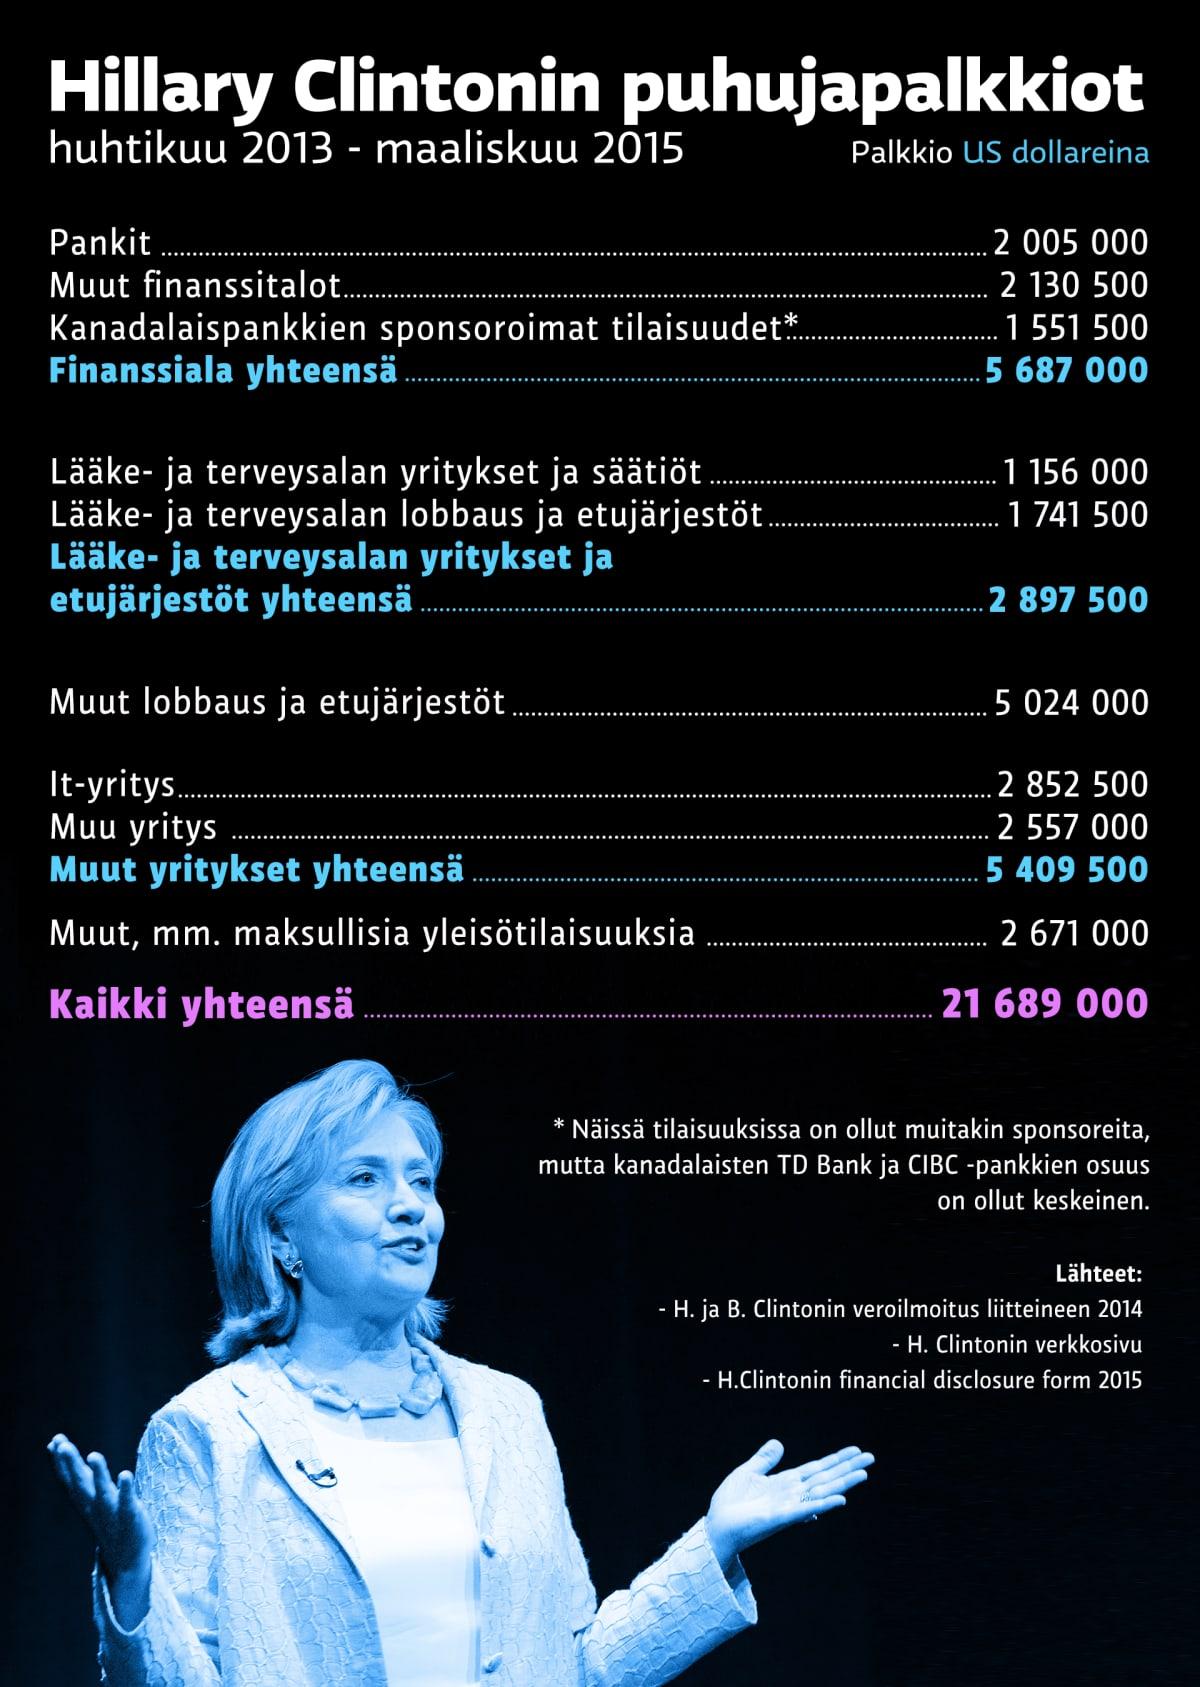 Hilary Clintonin puhujapalkkiot